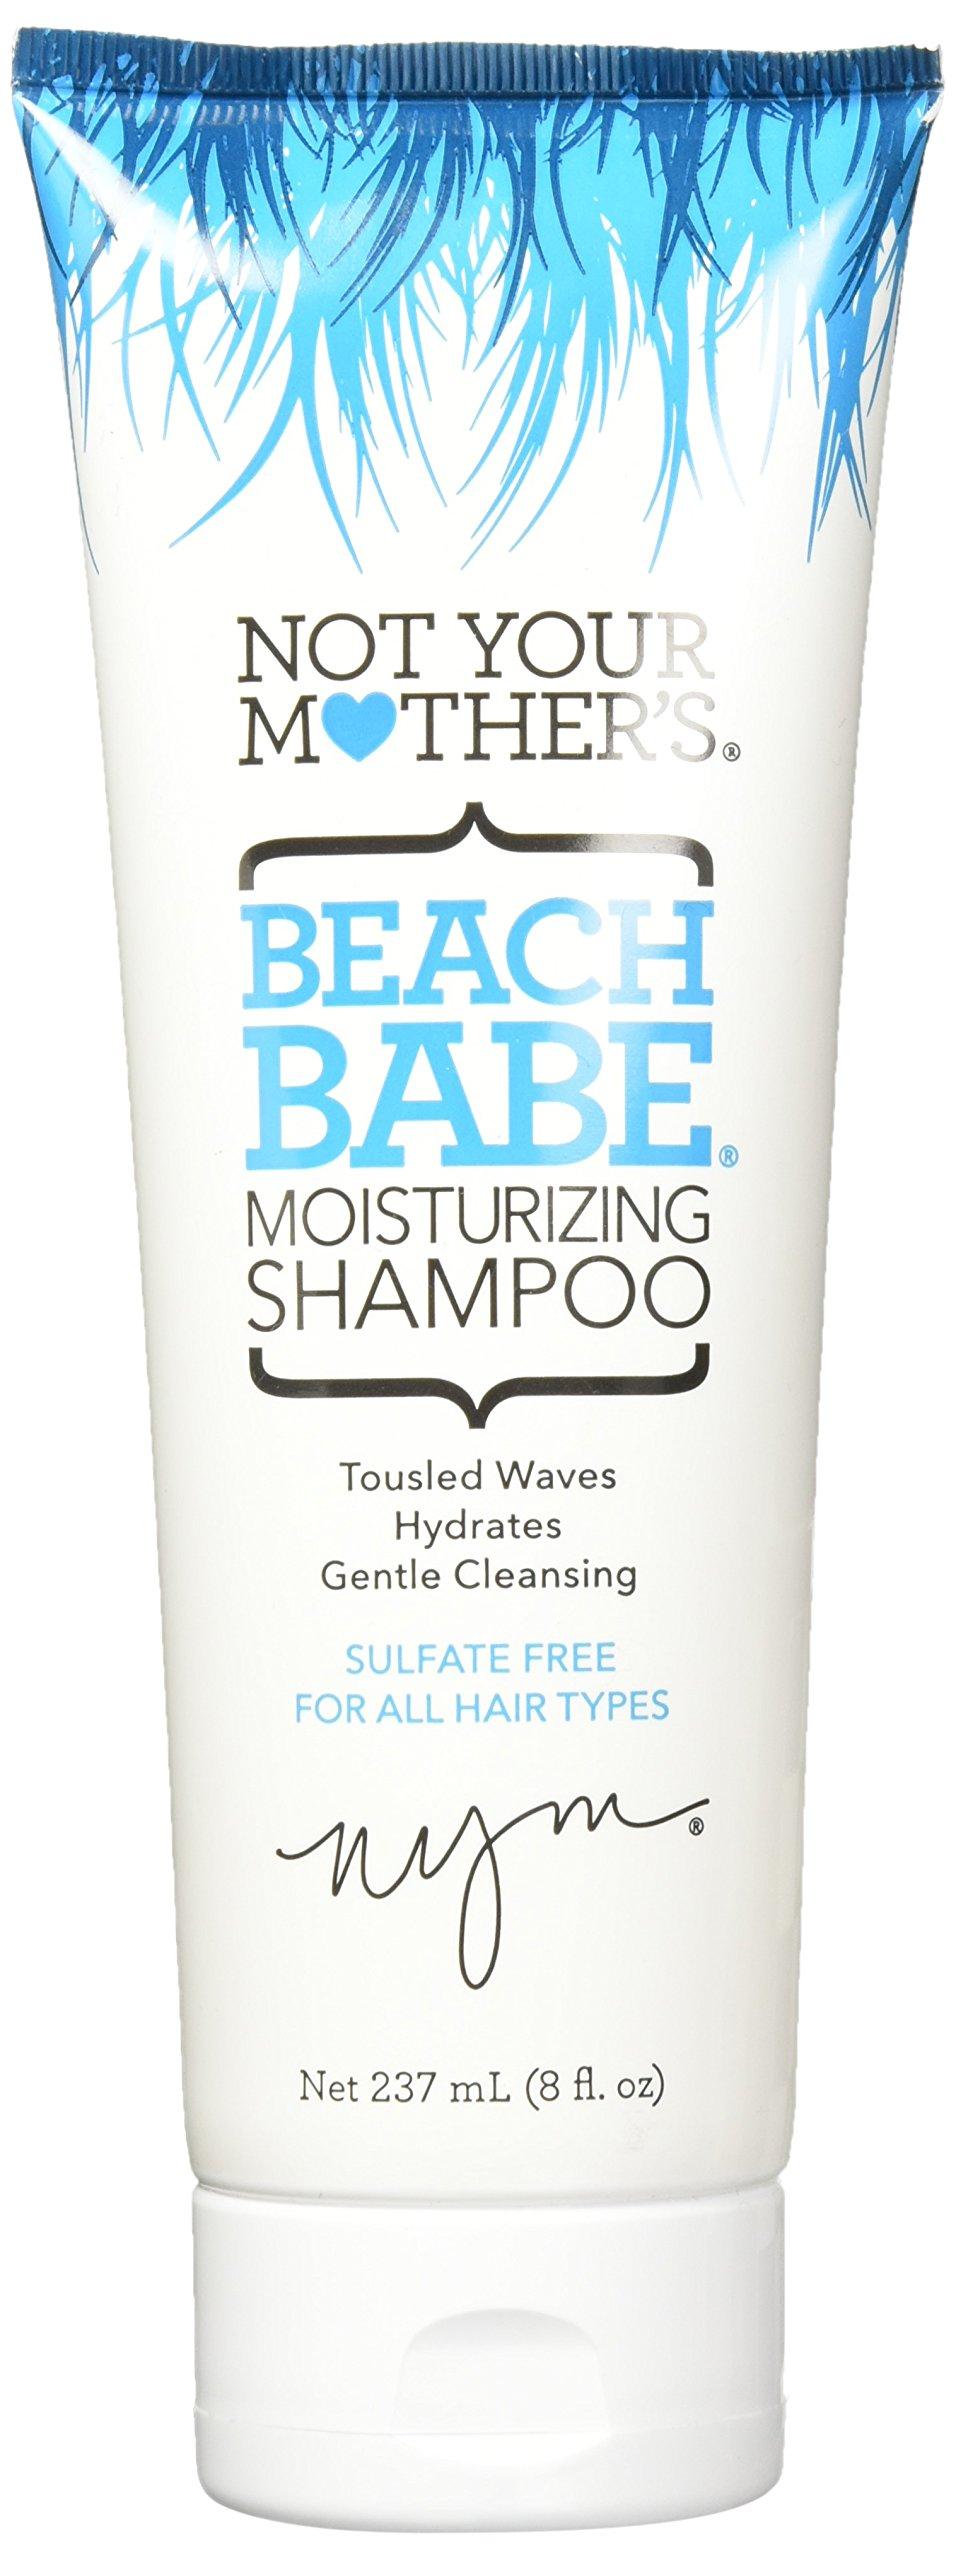 Not Your Mothers Shampoo Beach Babe Moisturizing 8 Ounce (235ml)